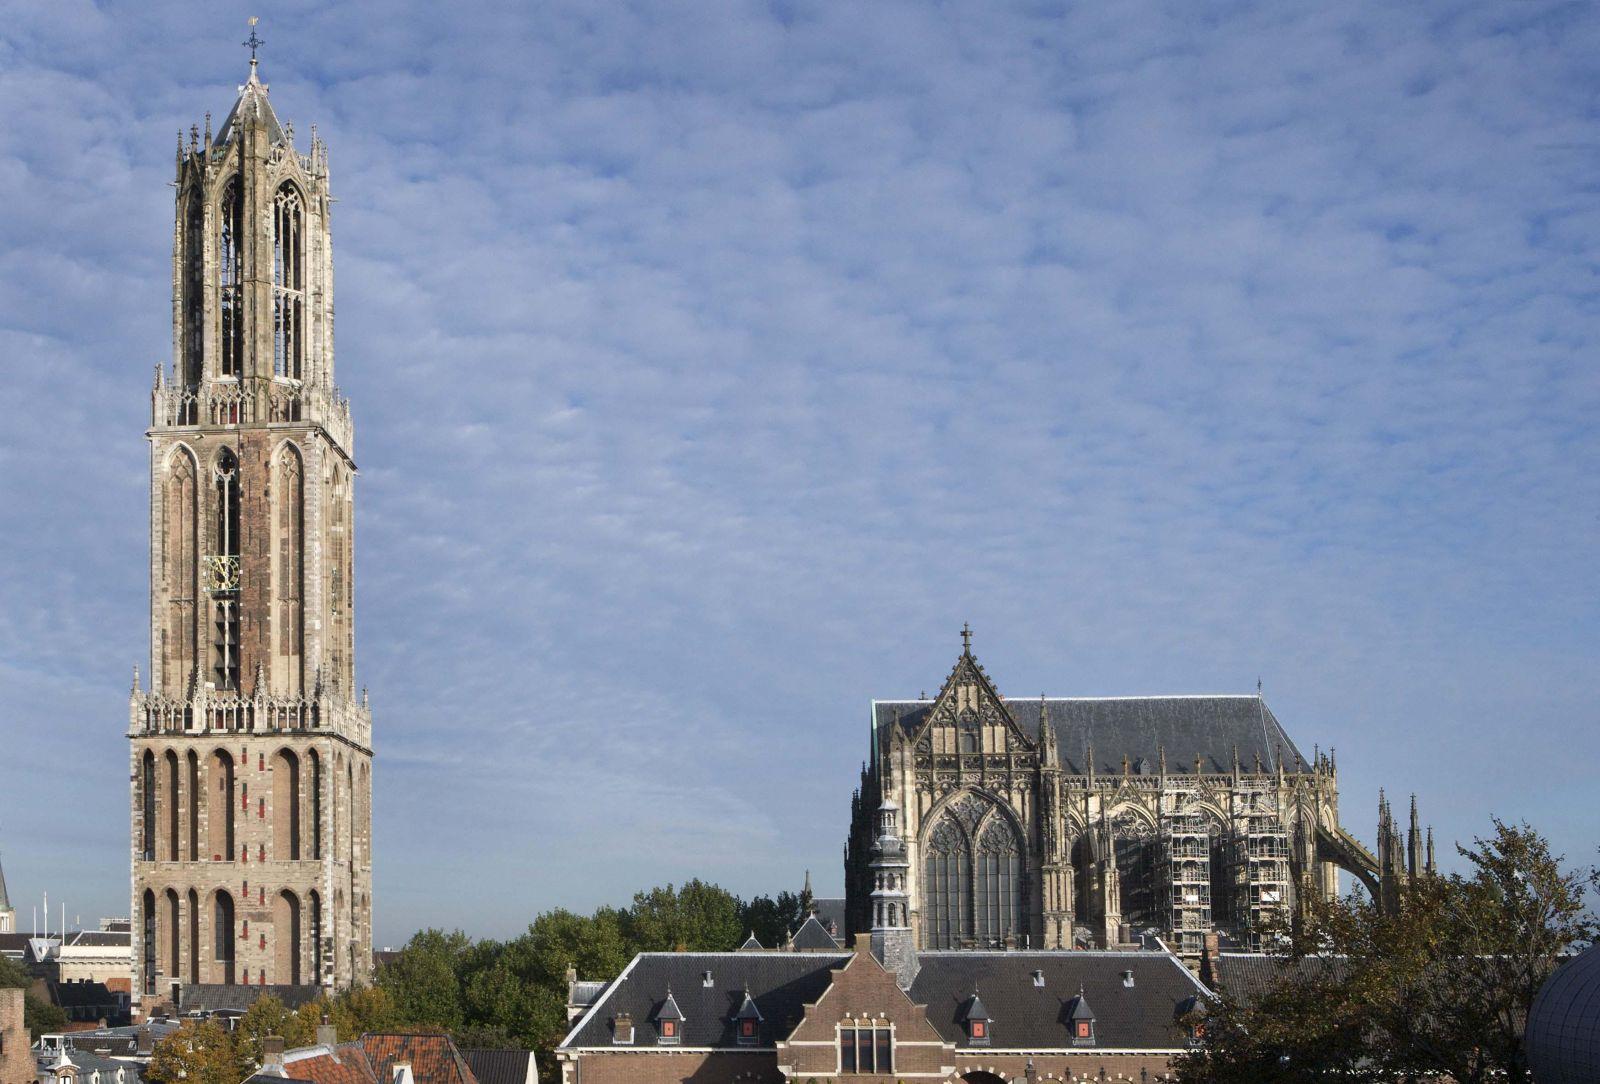 http://150psalms.com/wp-content/uploads/2017/02/dom-van-Utrecht-1.jpg